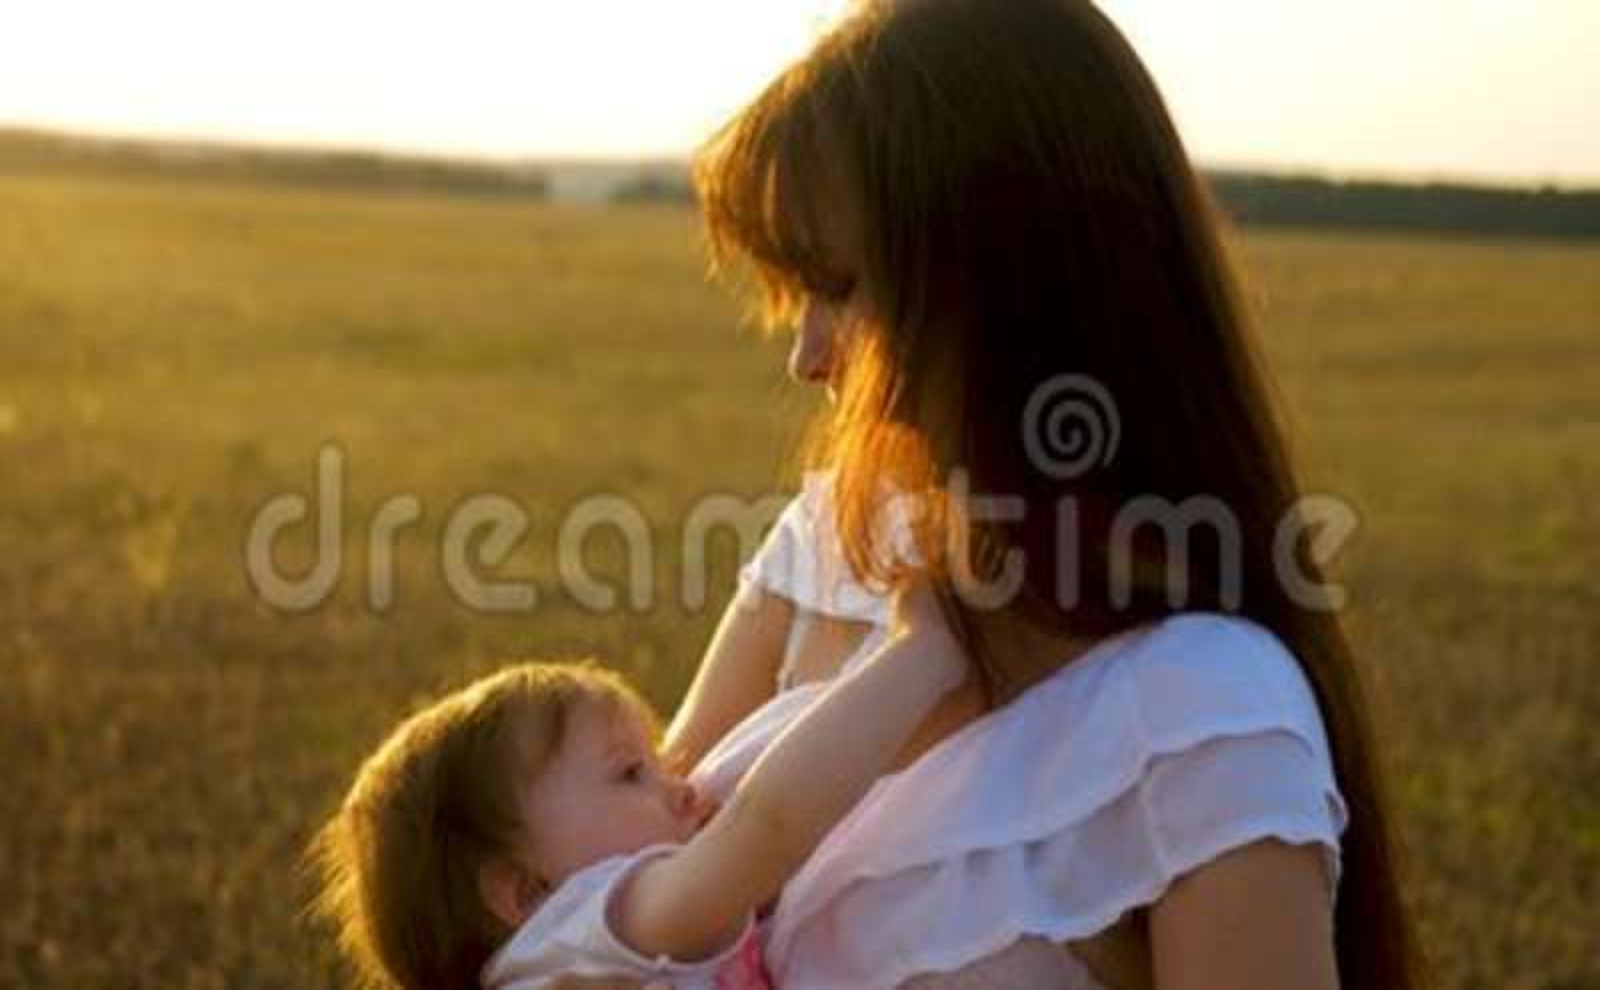 Pity, that daughter sucks mom milk